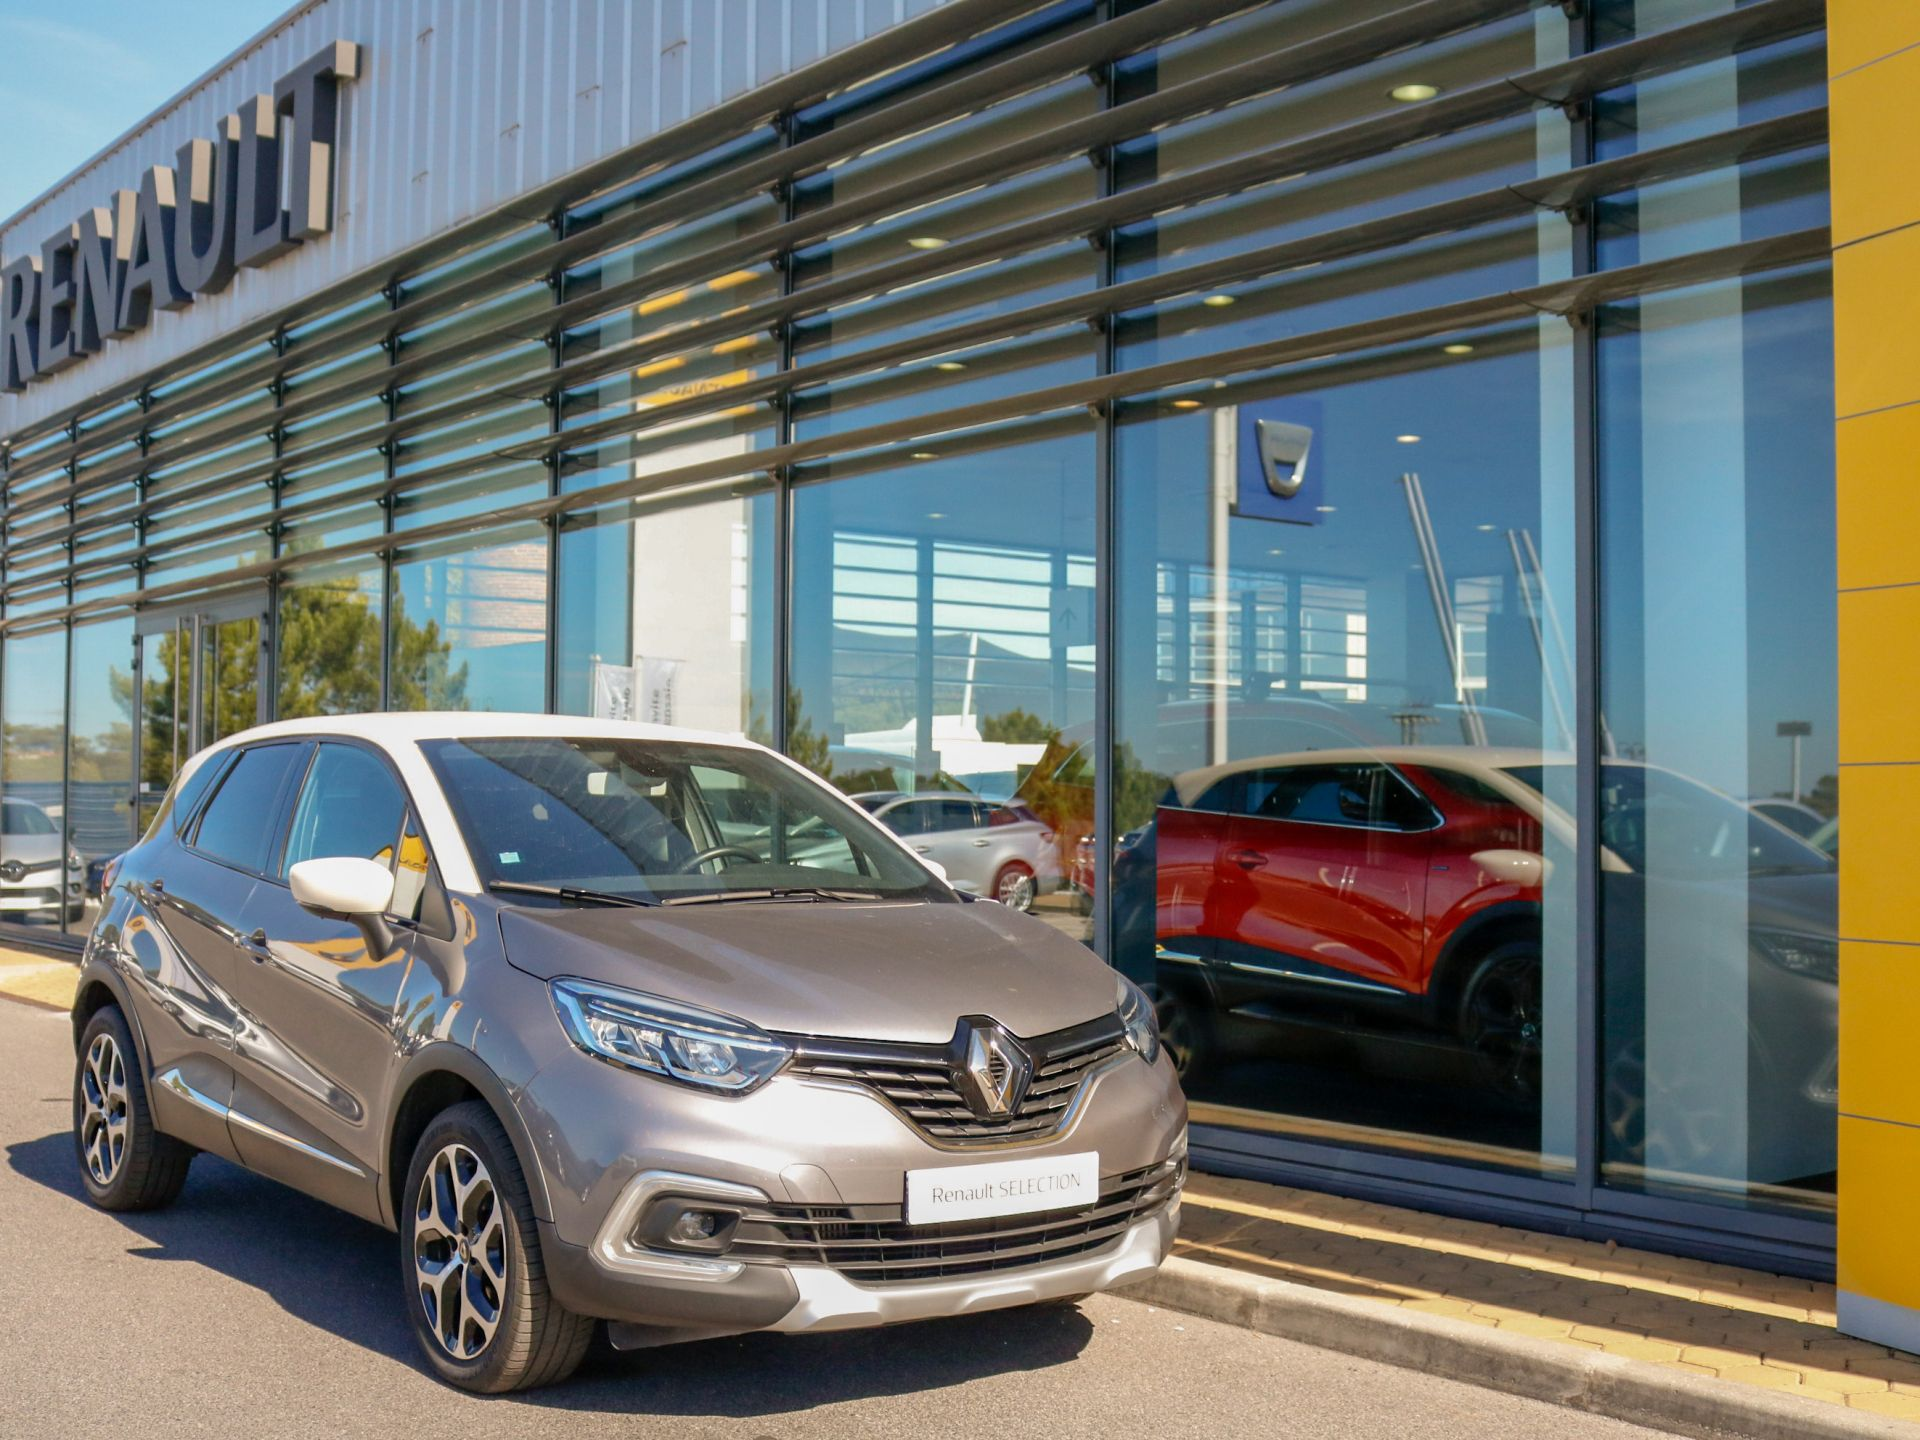 Renault Captur 0.9 TCe 90 Exclusive segunda mão Setúbal